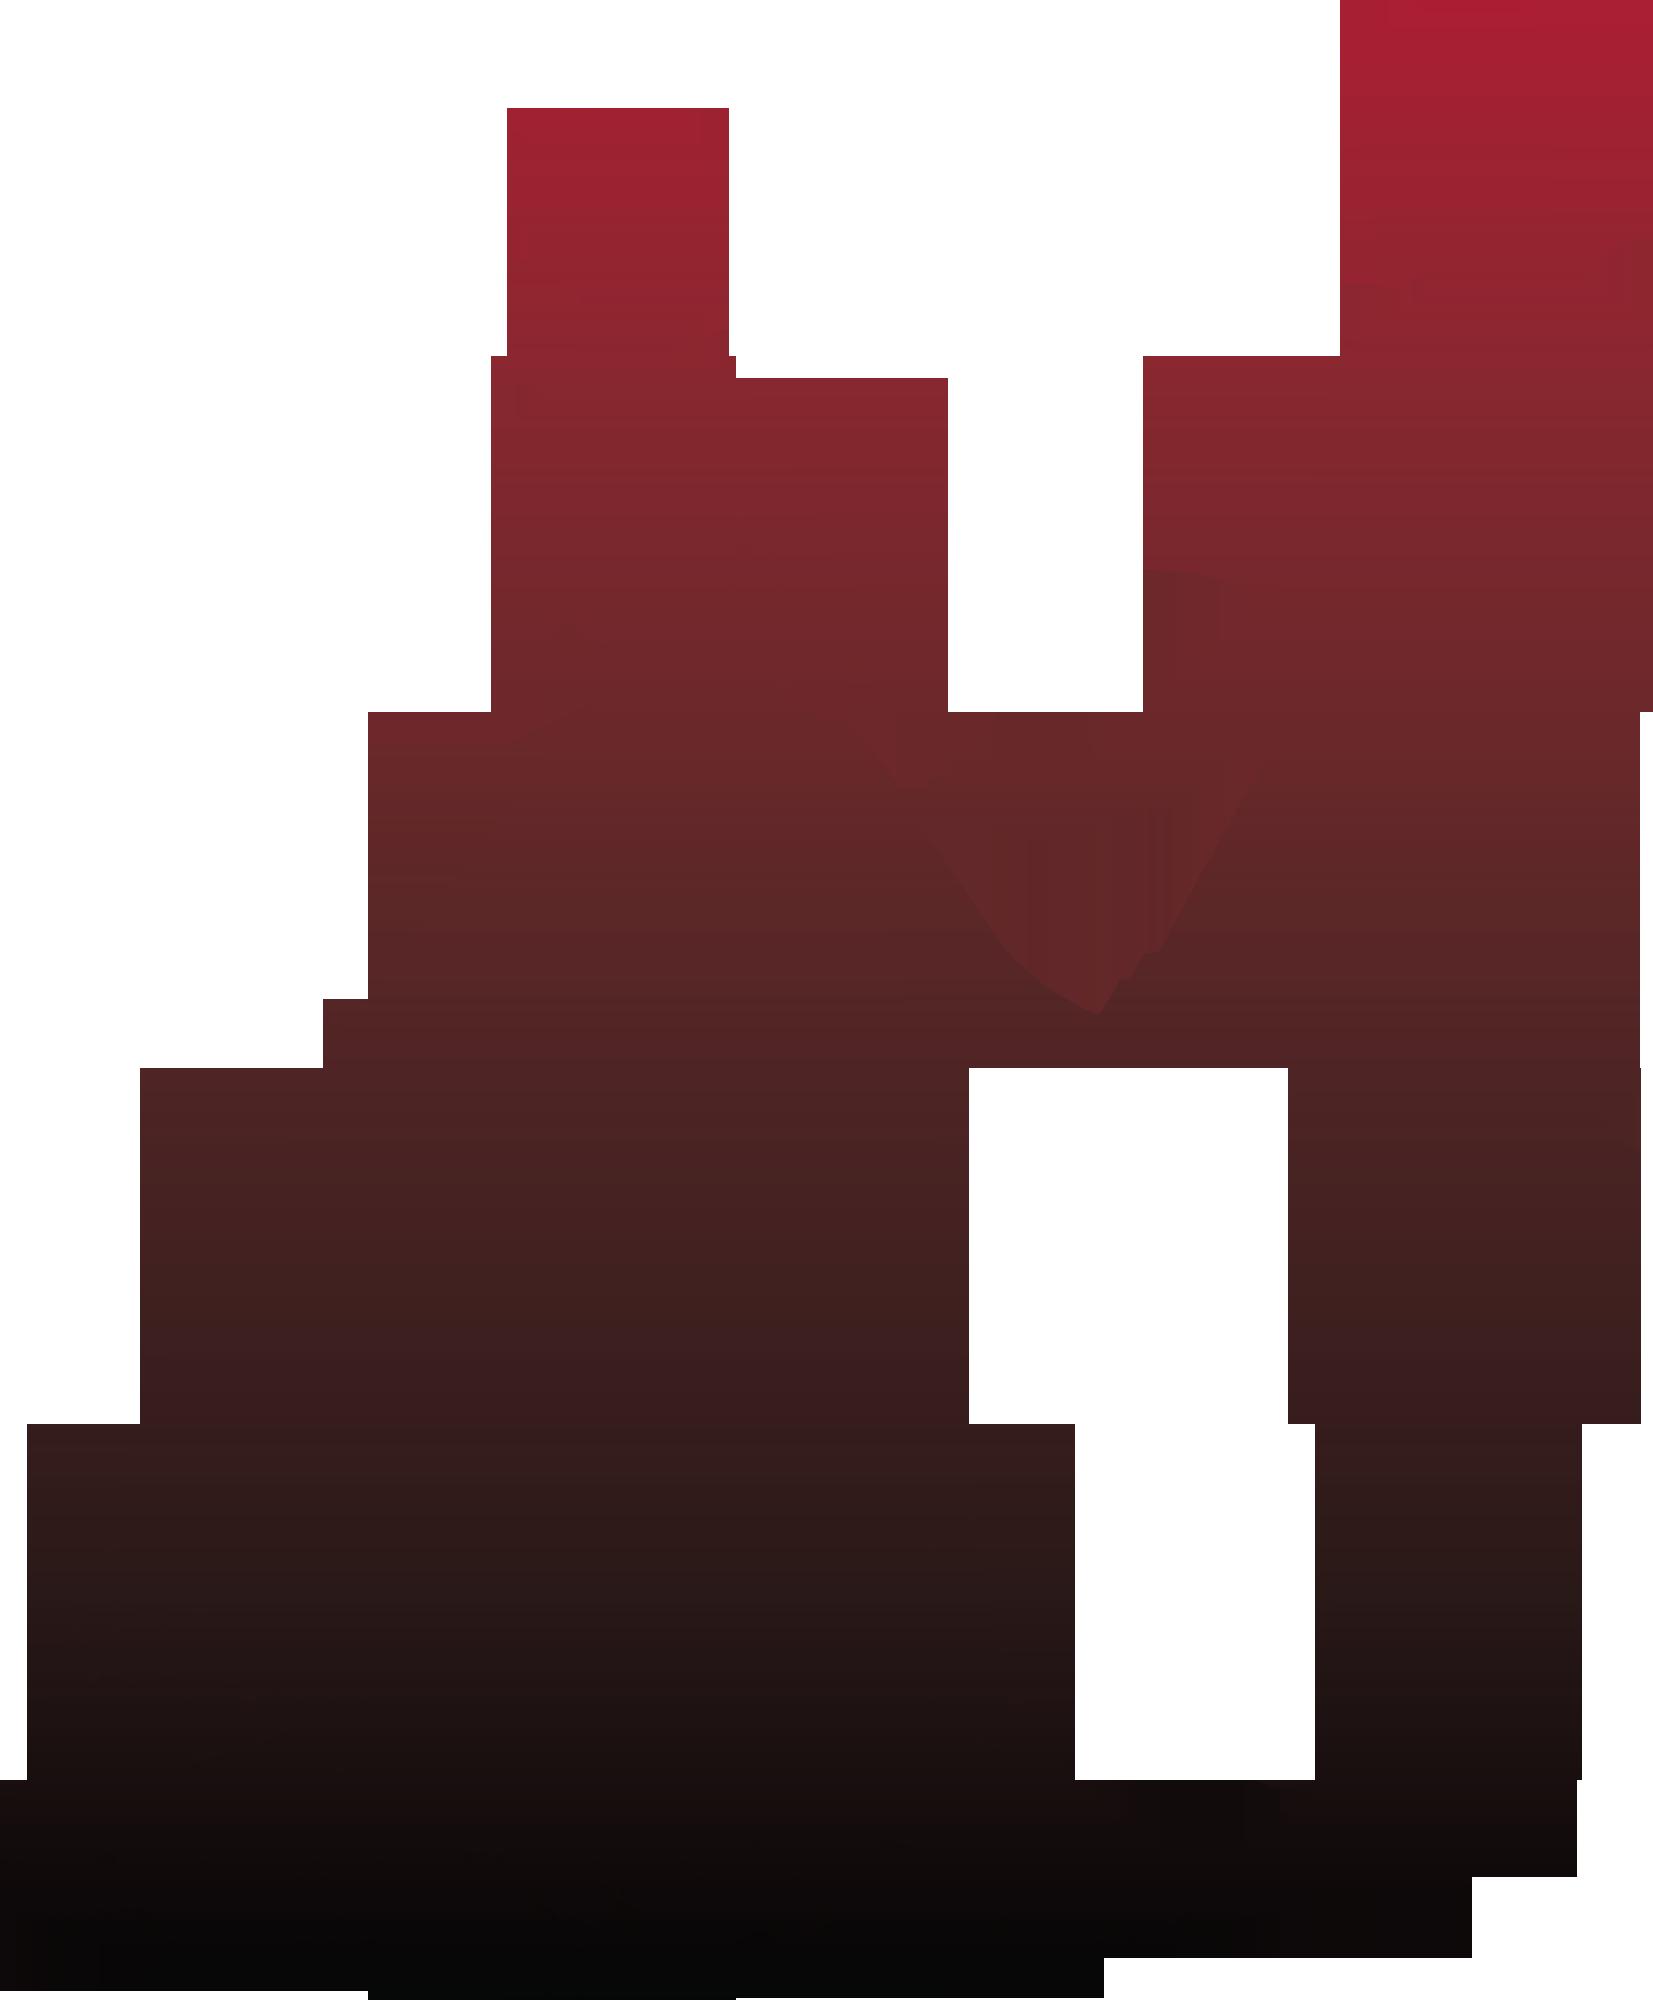 Wedding Couple Clipart Png: Pin De Эльмира Зверева Em свадьба